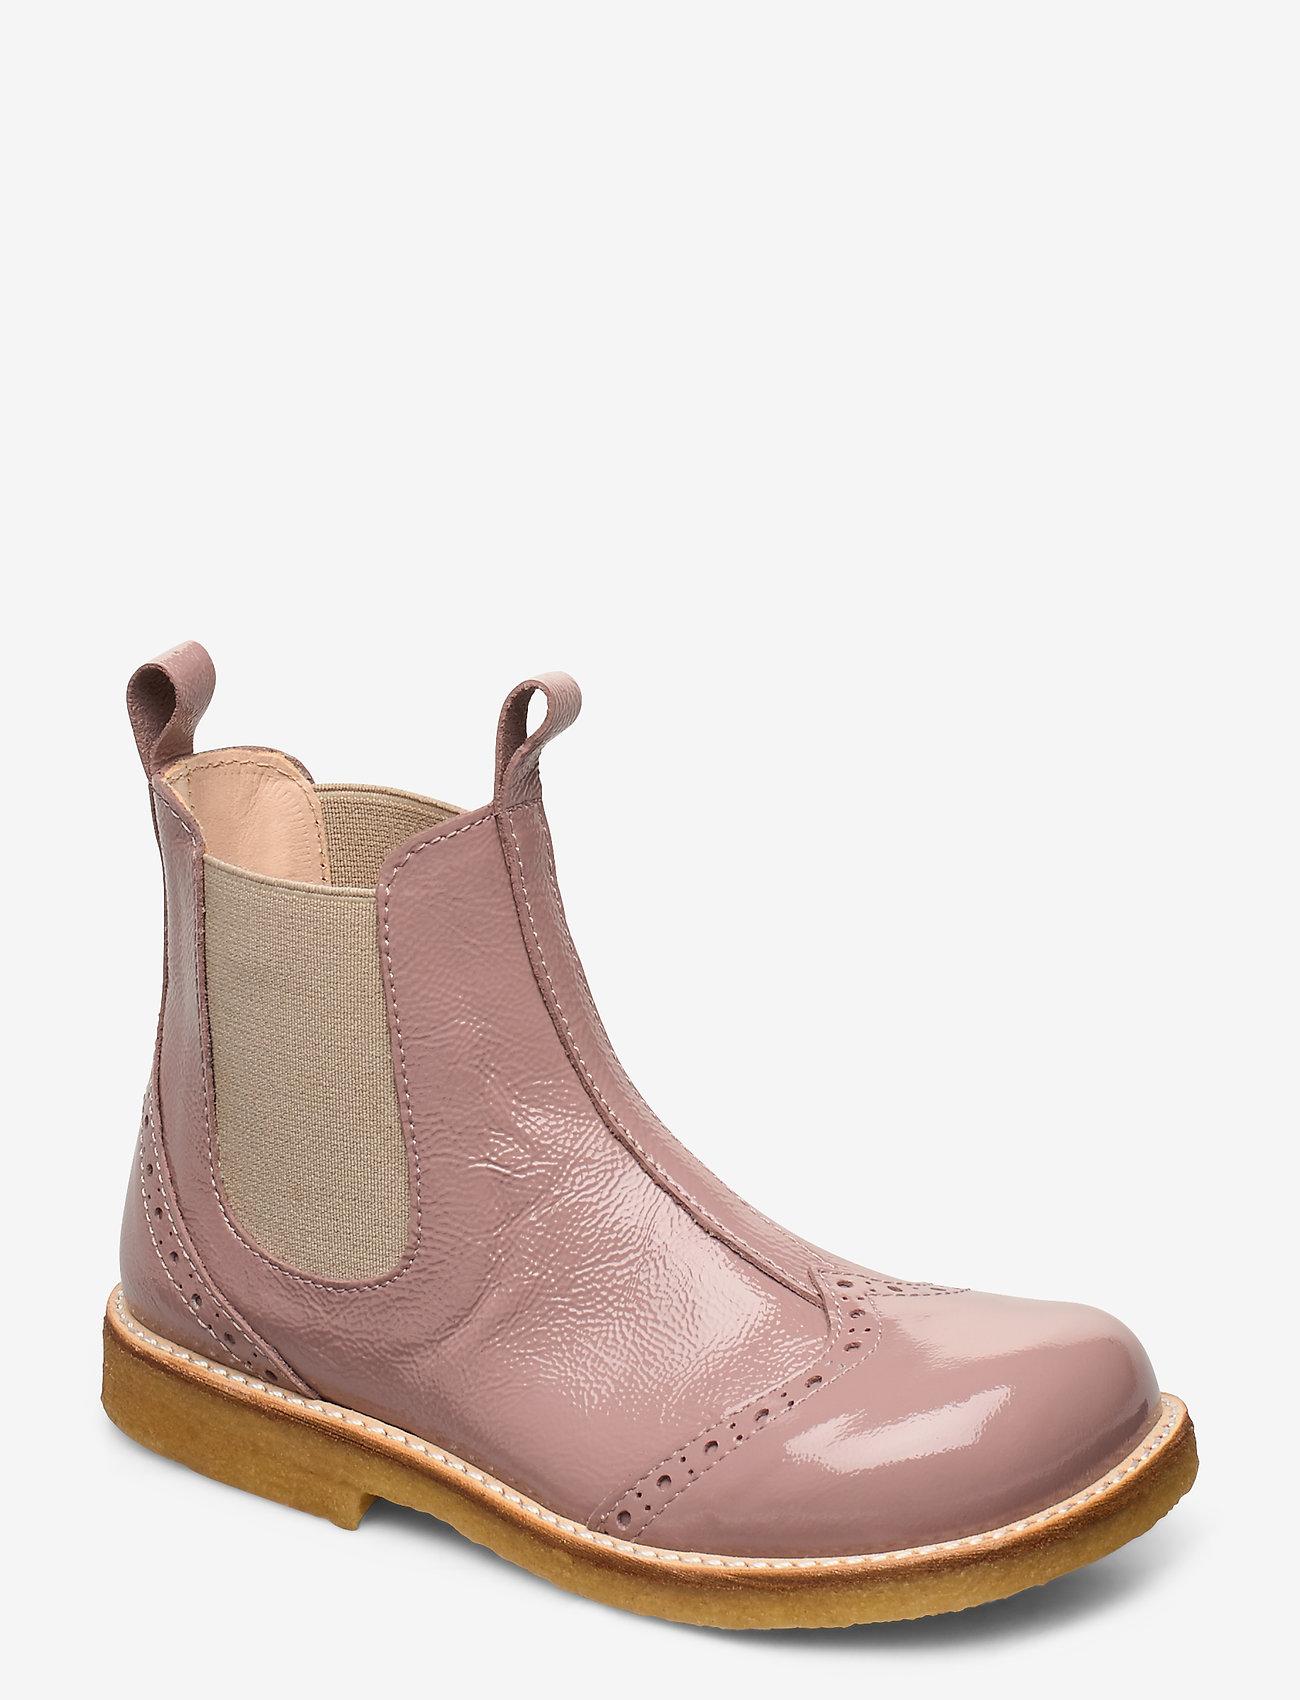 ANGULUS - Booties - flat - with elastic - stövlar & kängor - 1387/010 patent powder/beige - 0